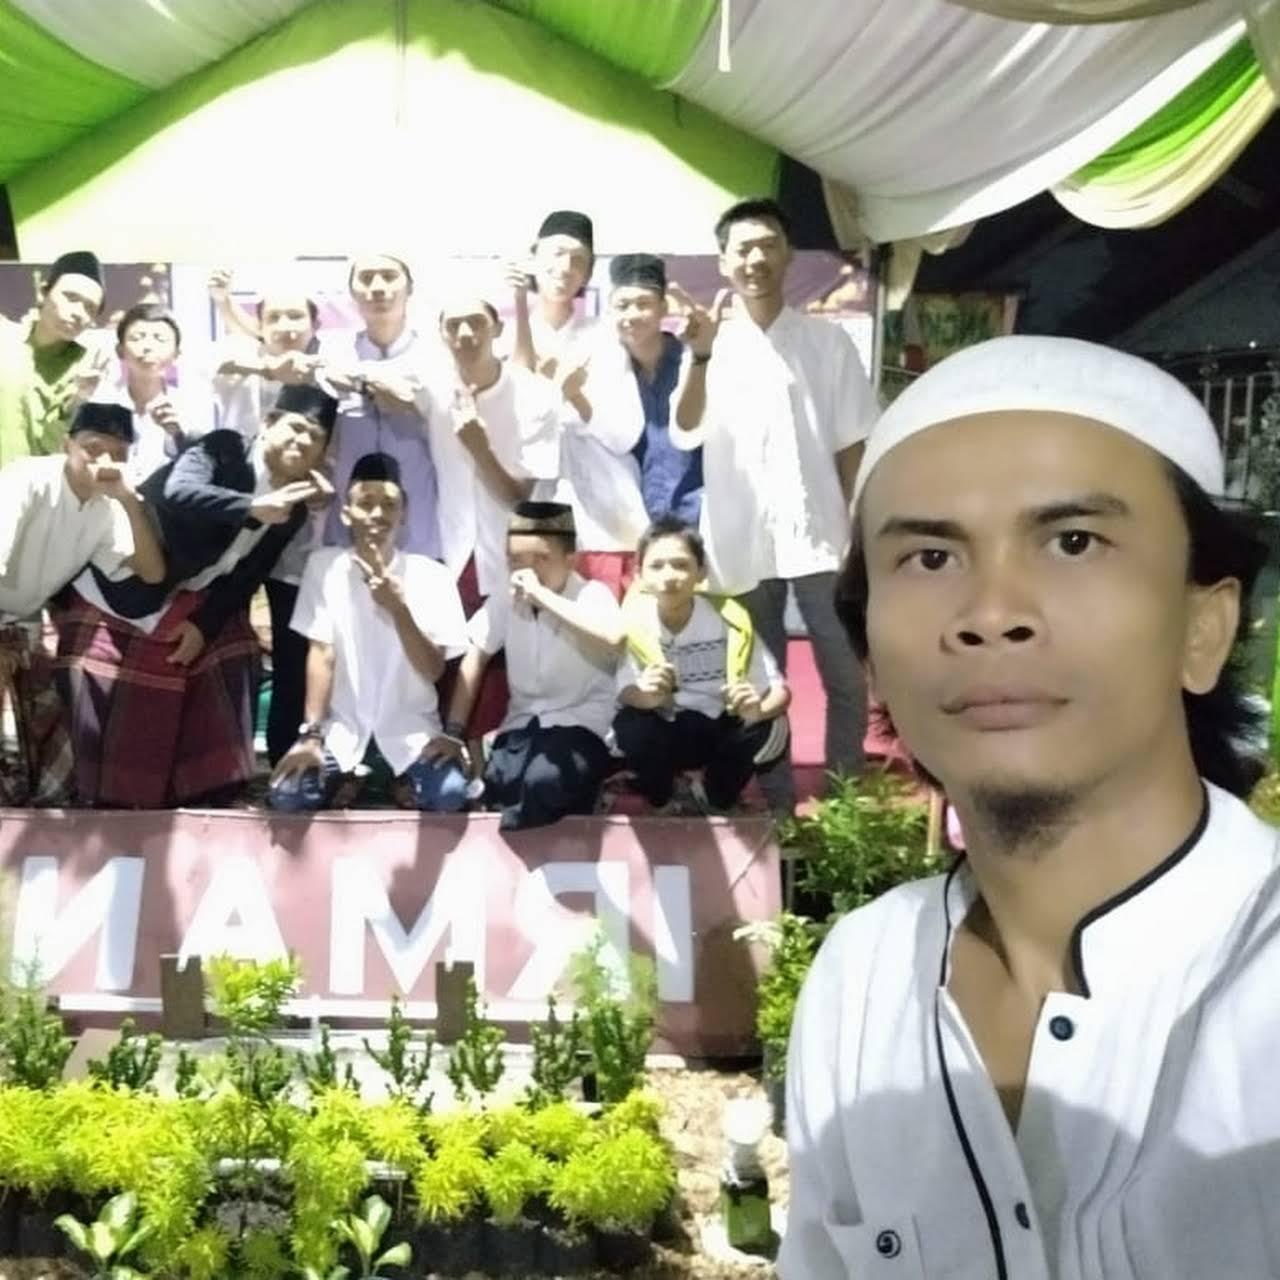 Jasa Dekorasi Panggung Pembuatan Sewa Dekorasi Taman Panggung